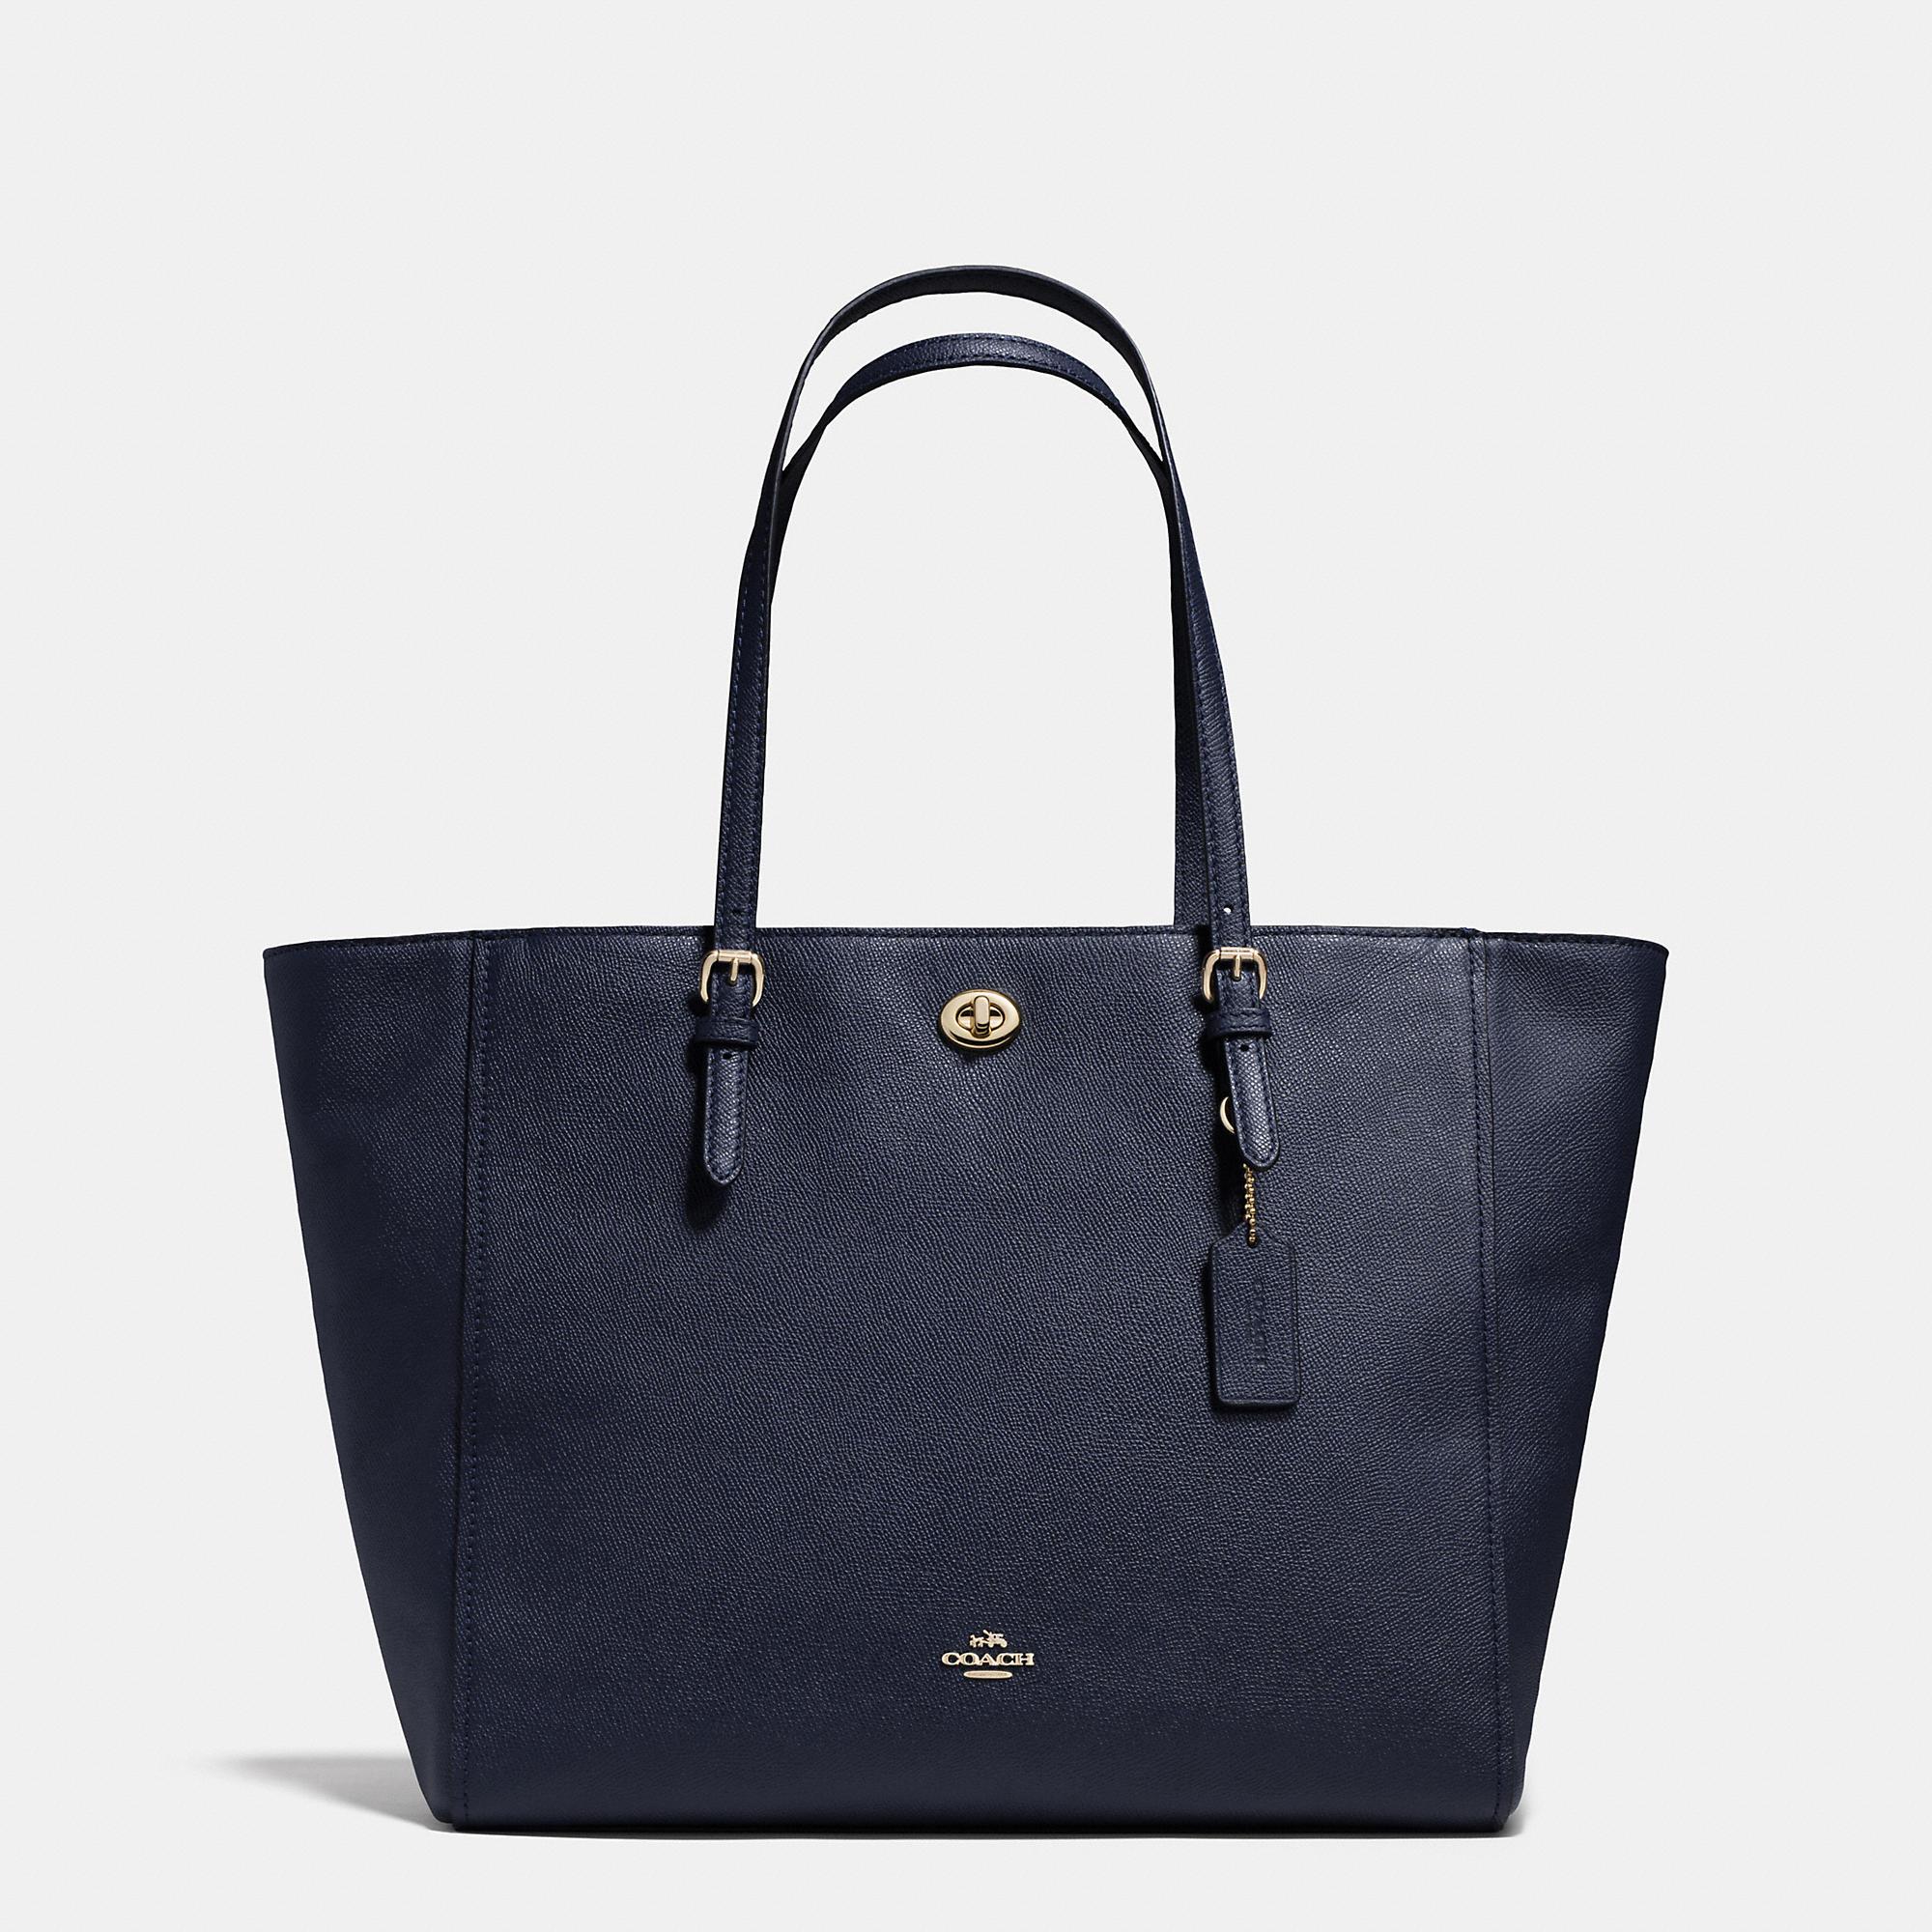 Coach Turnlock Baby Bag In Crossgrain Leather